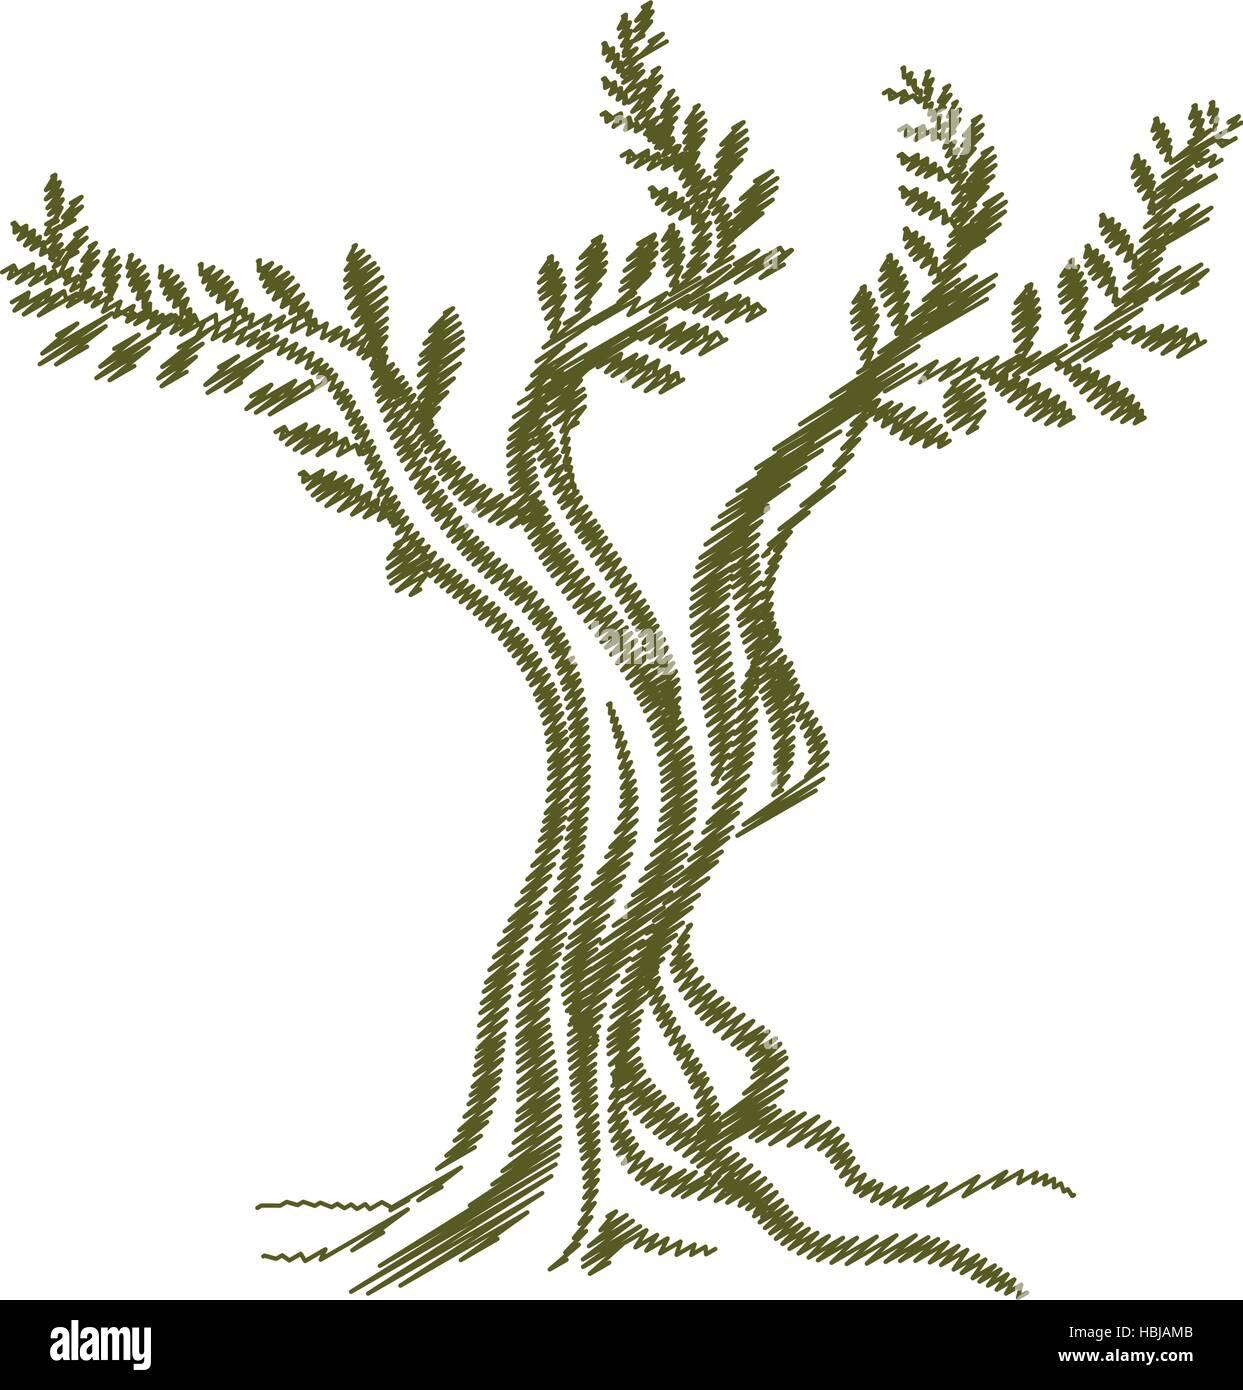 baum olivenzweig skizze symbol vektor illustration eps 10 vektor